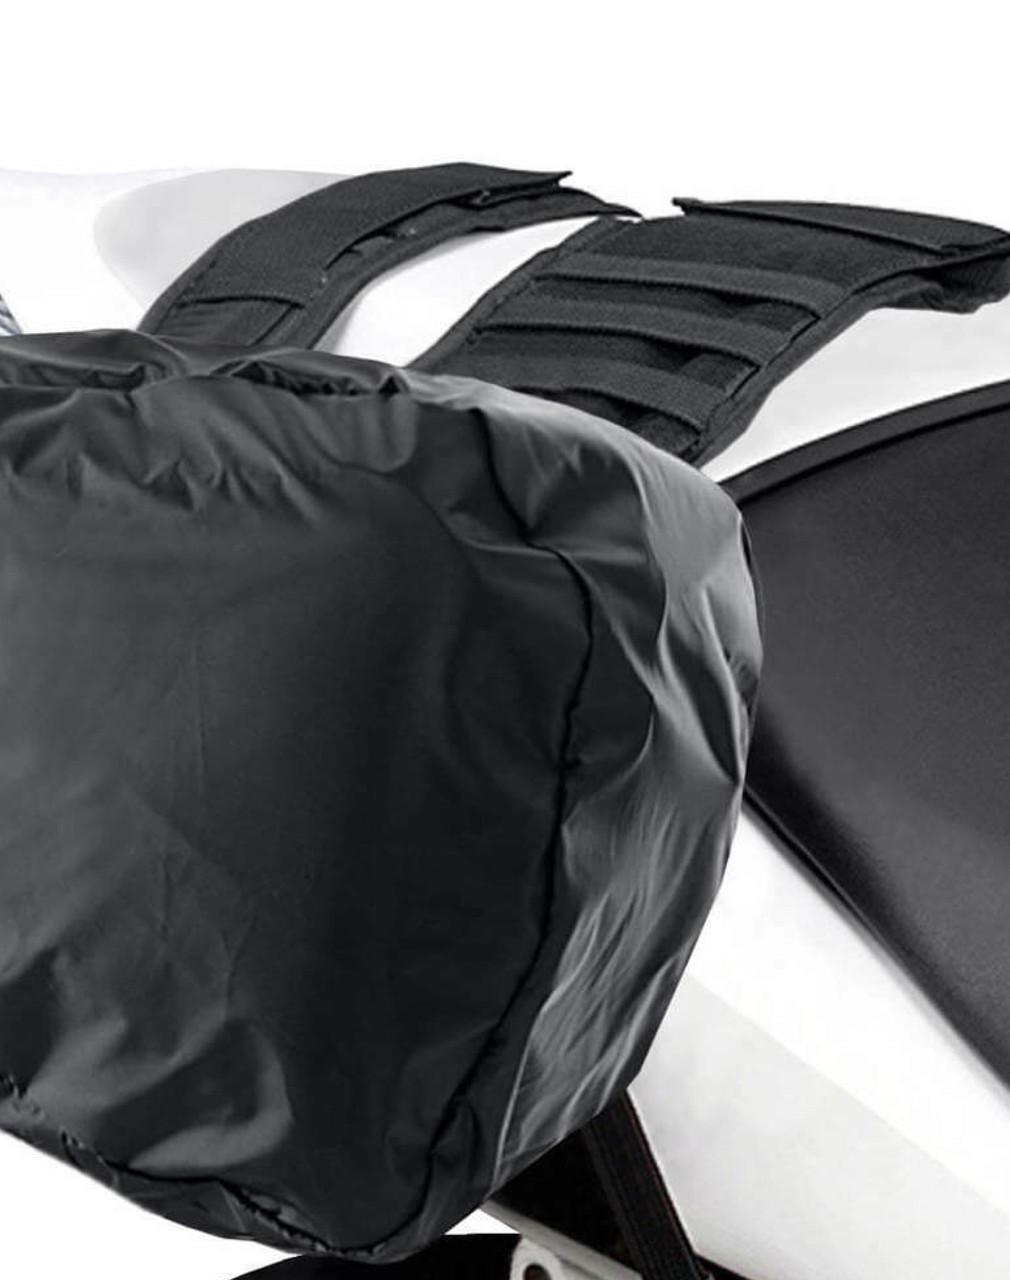 Viking AXE Medium Black Motorcycle Triumph Bonneville T120 Saddlebags Rain Cover